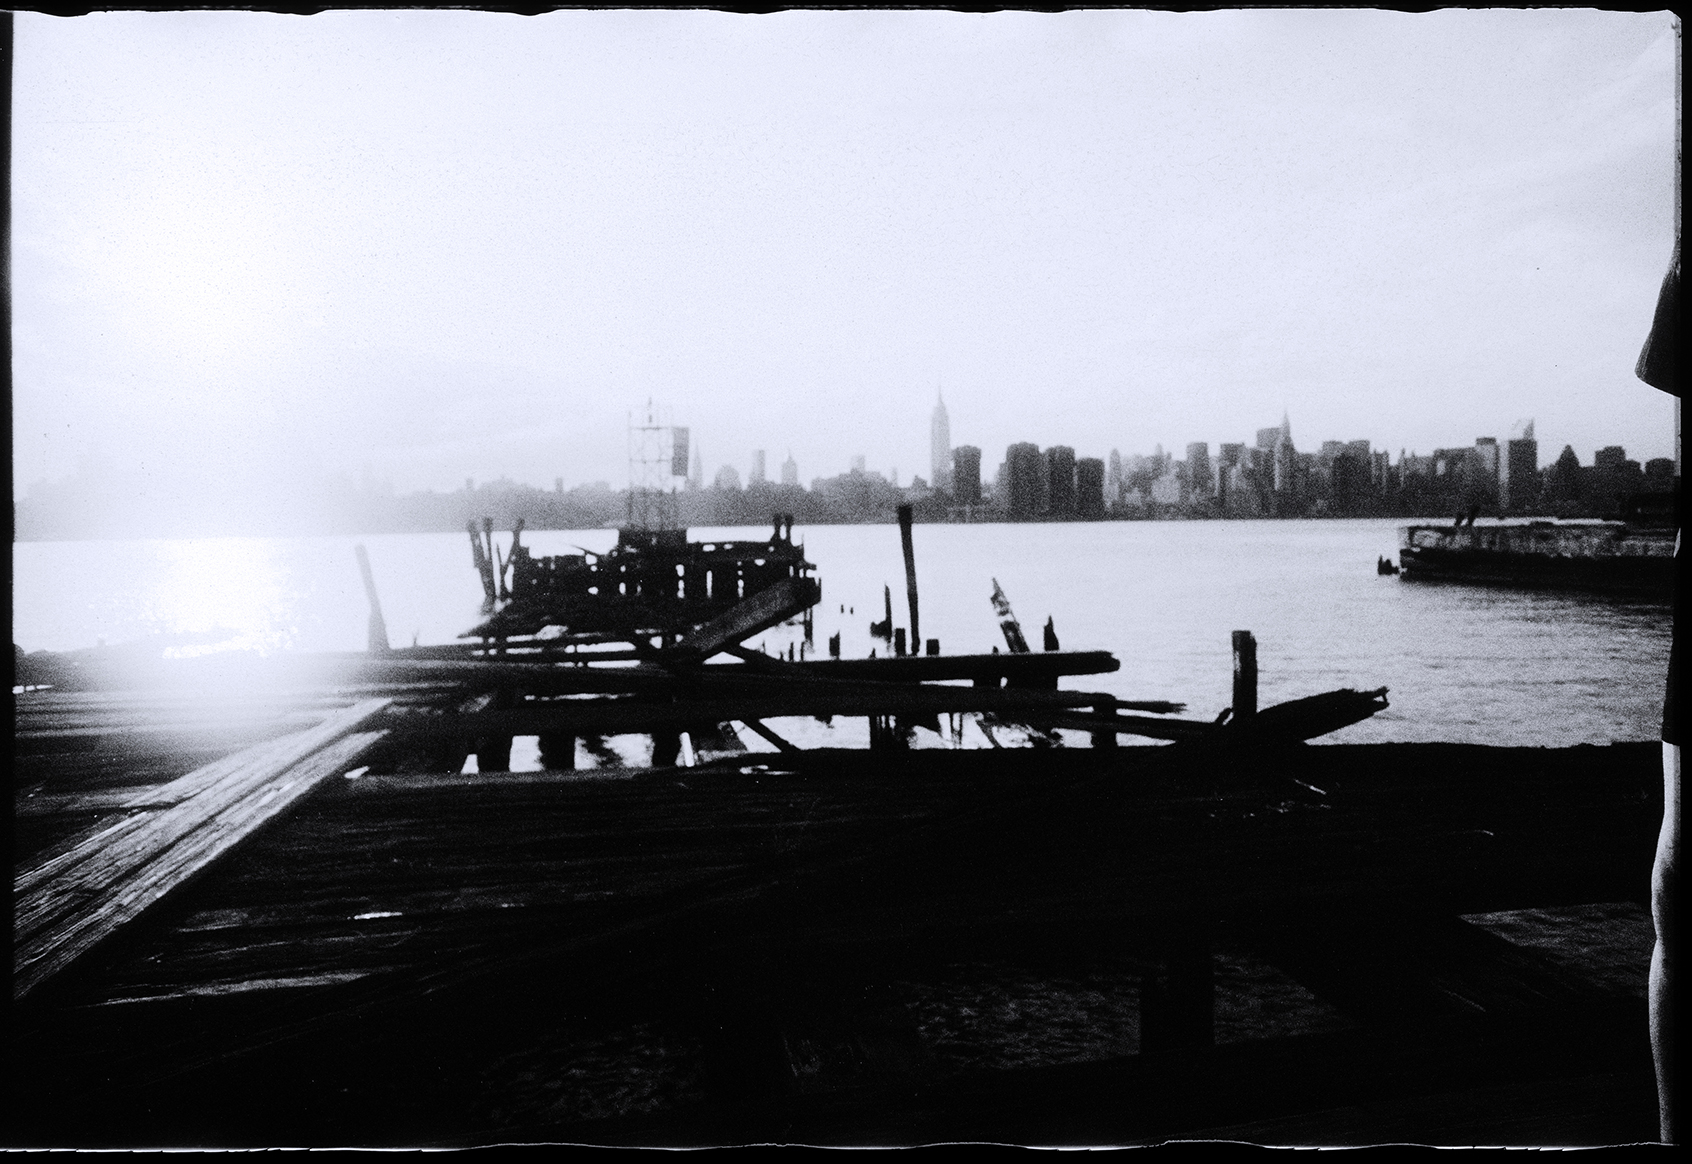 Waterfront_Pier_Silver_17x11.5_100dpi.jpg